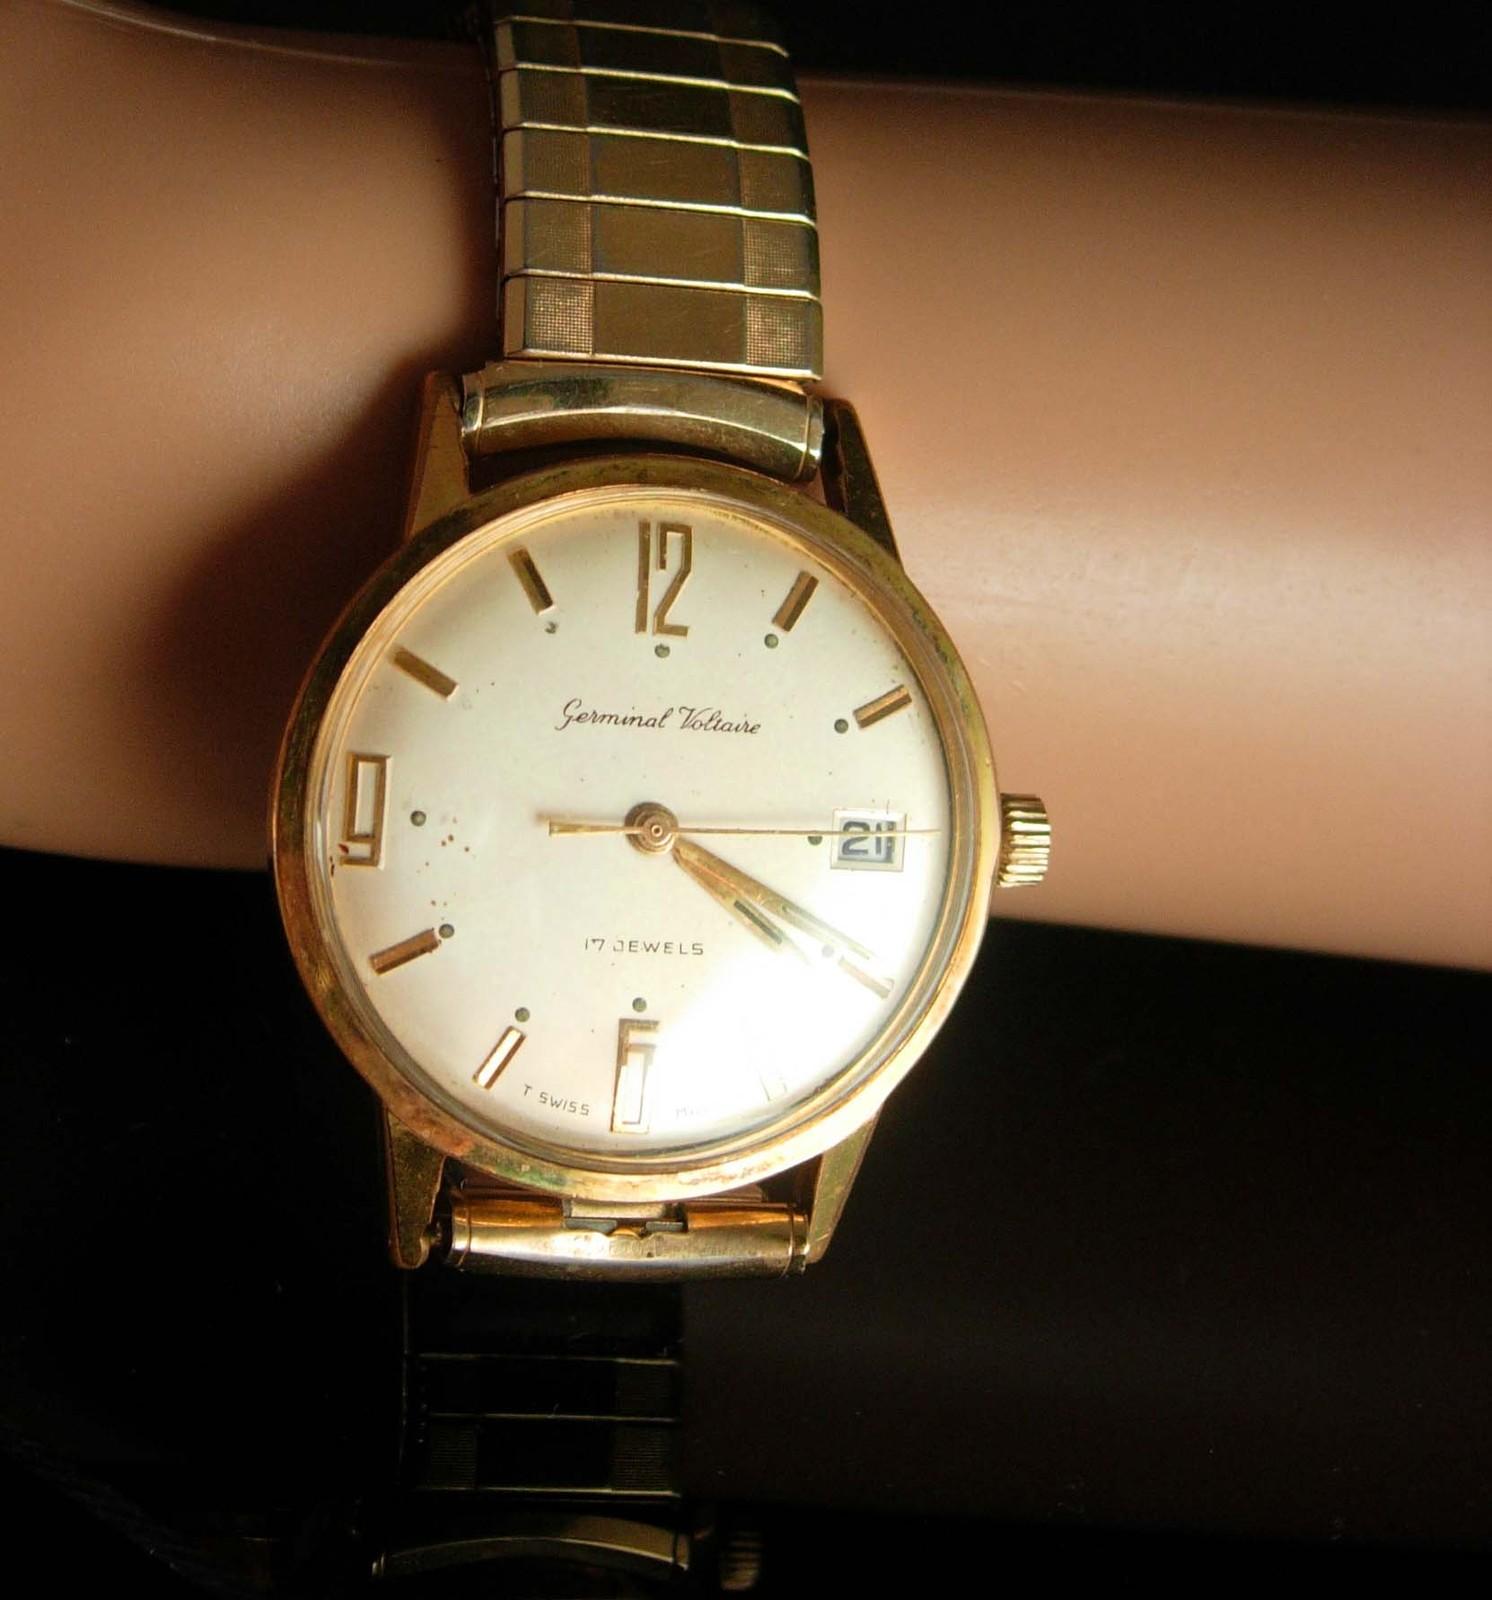 Vintage watch Germinal Voltaire 17 Jewel mens watch swiss watch manual Wind Mens